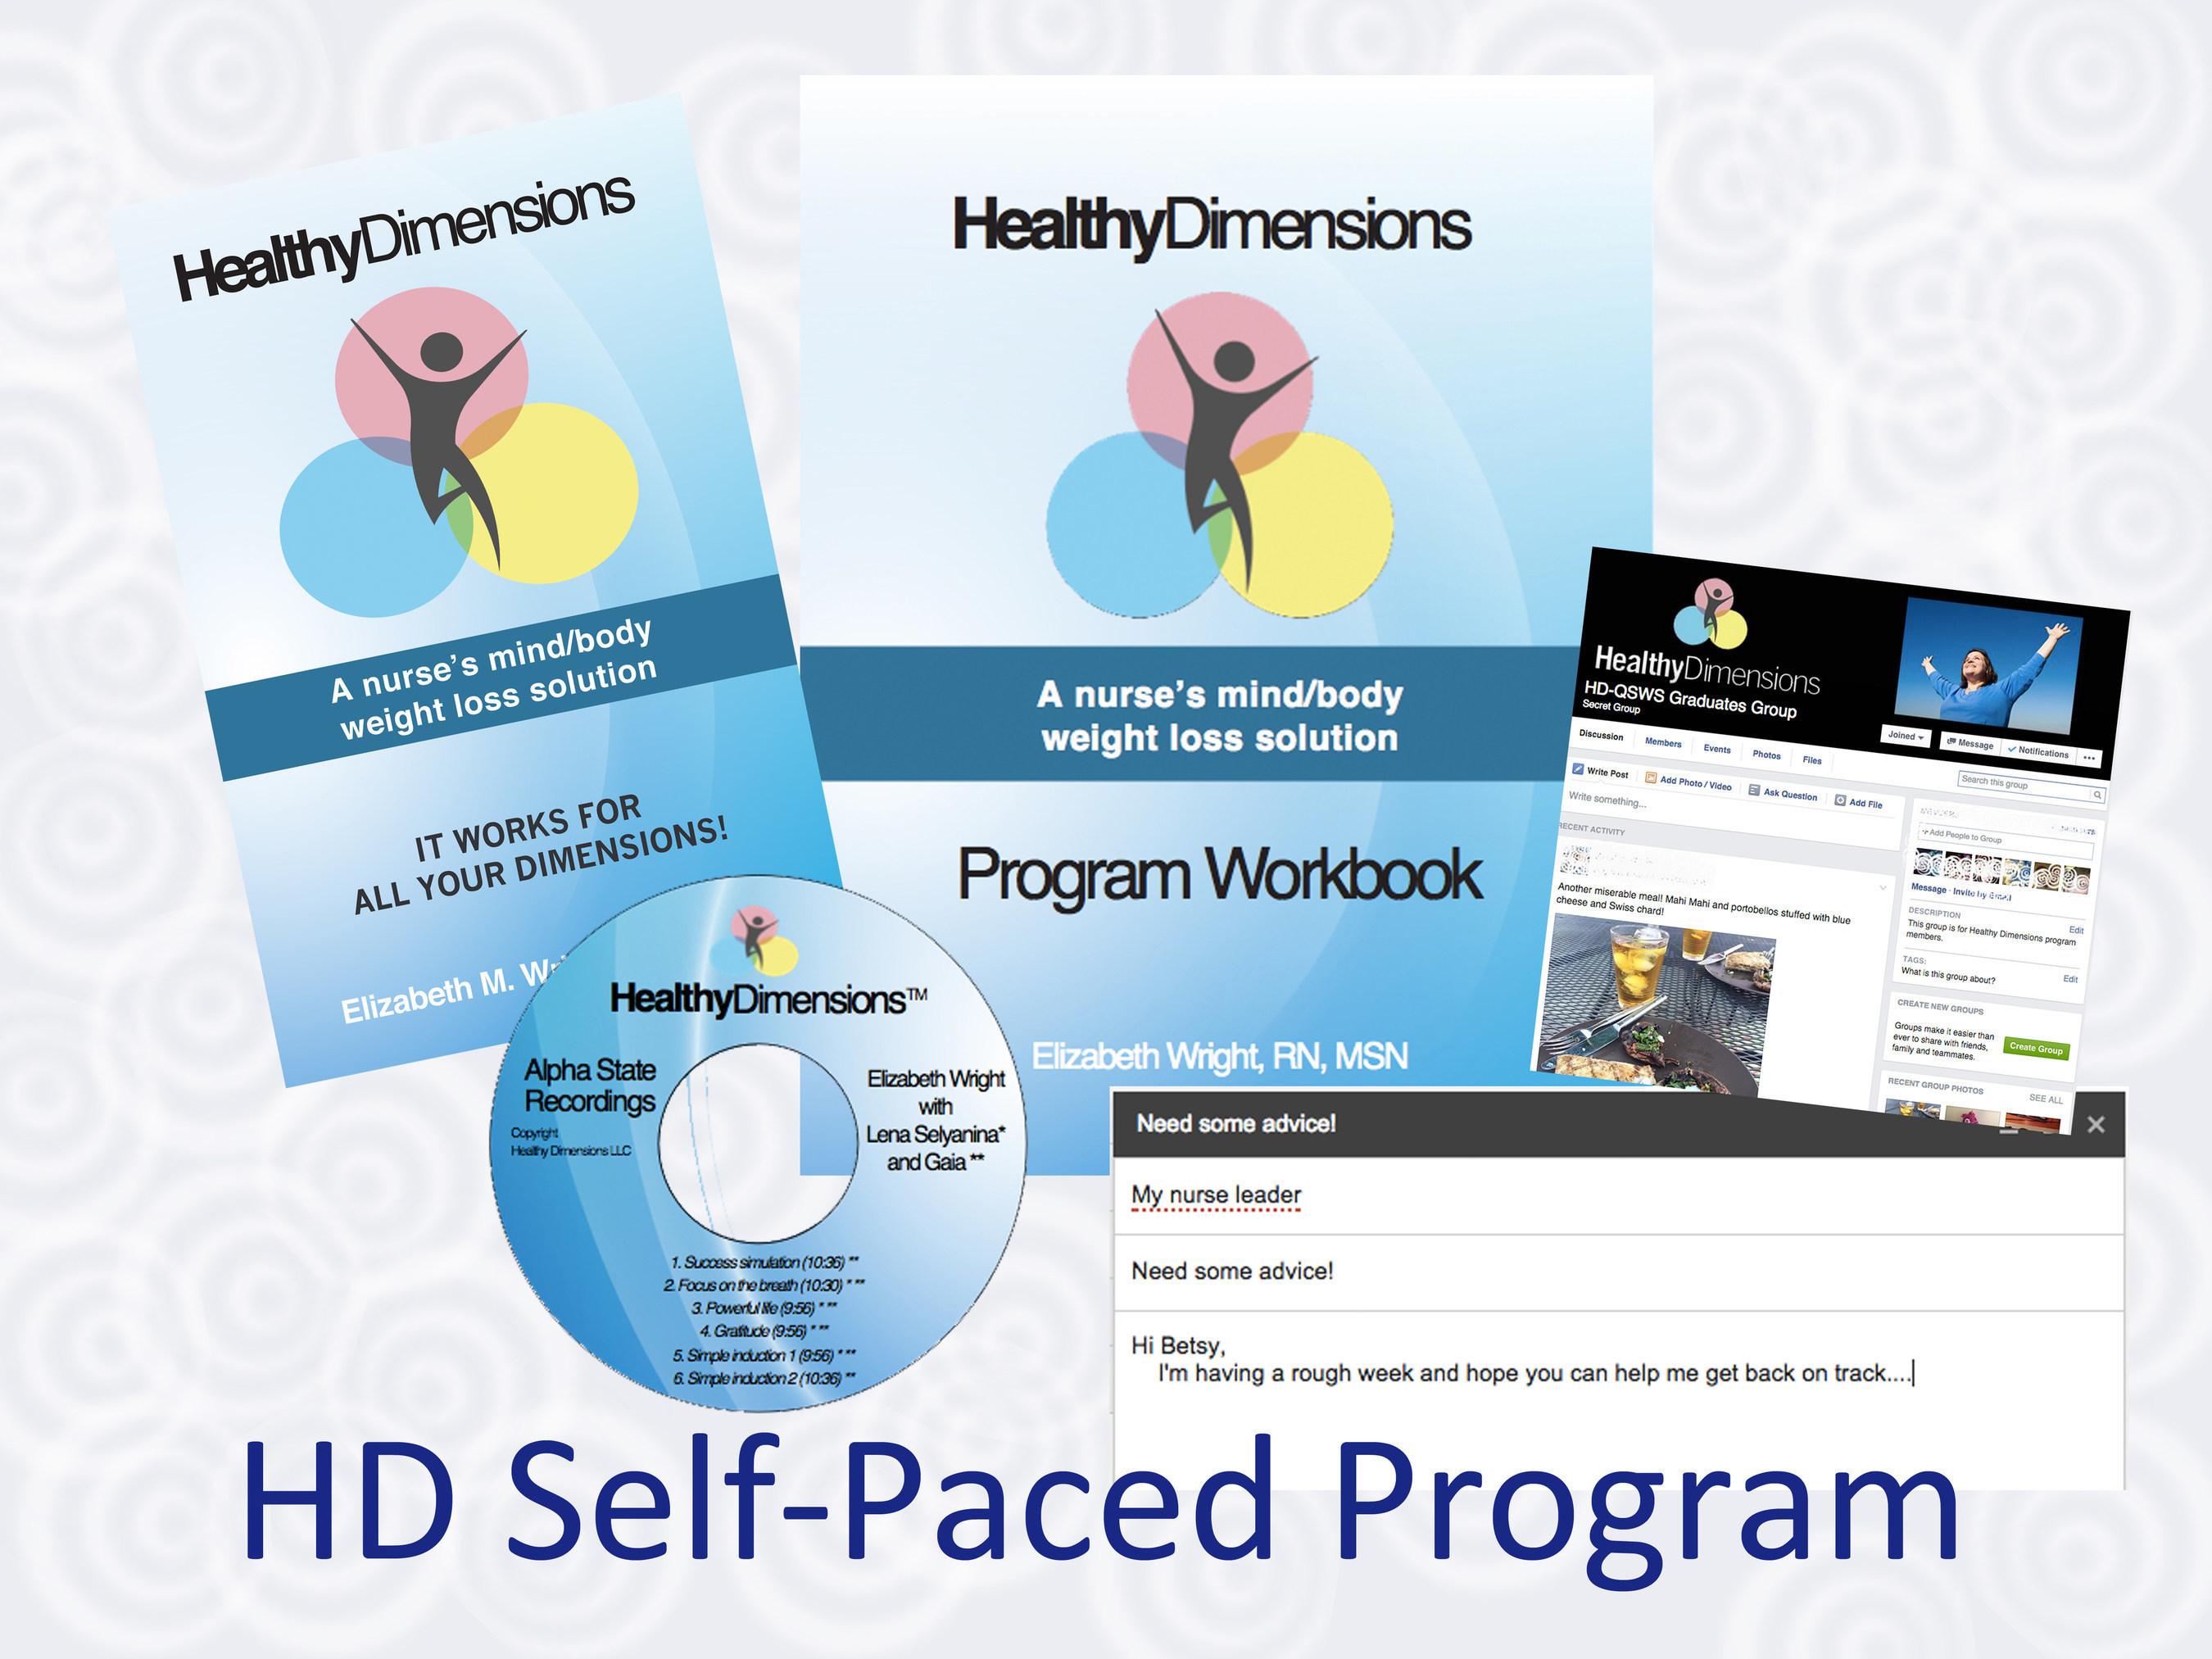 Holistic Evidence Based Weight Loss Program Seeks To Shift